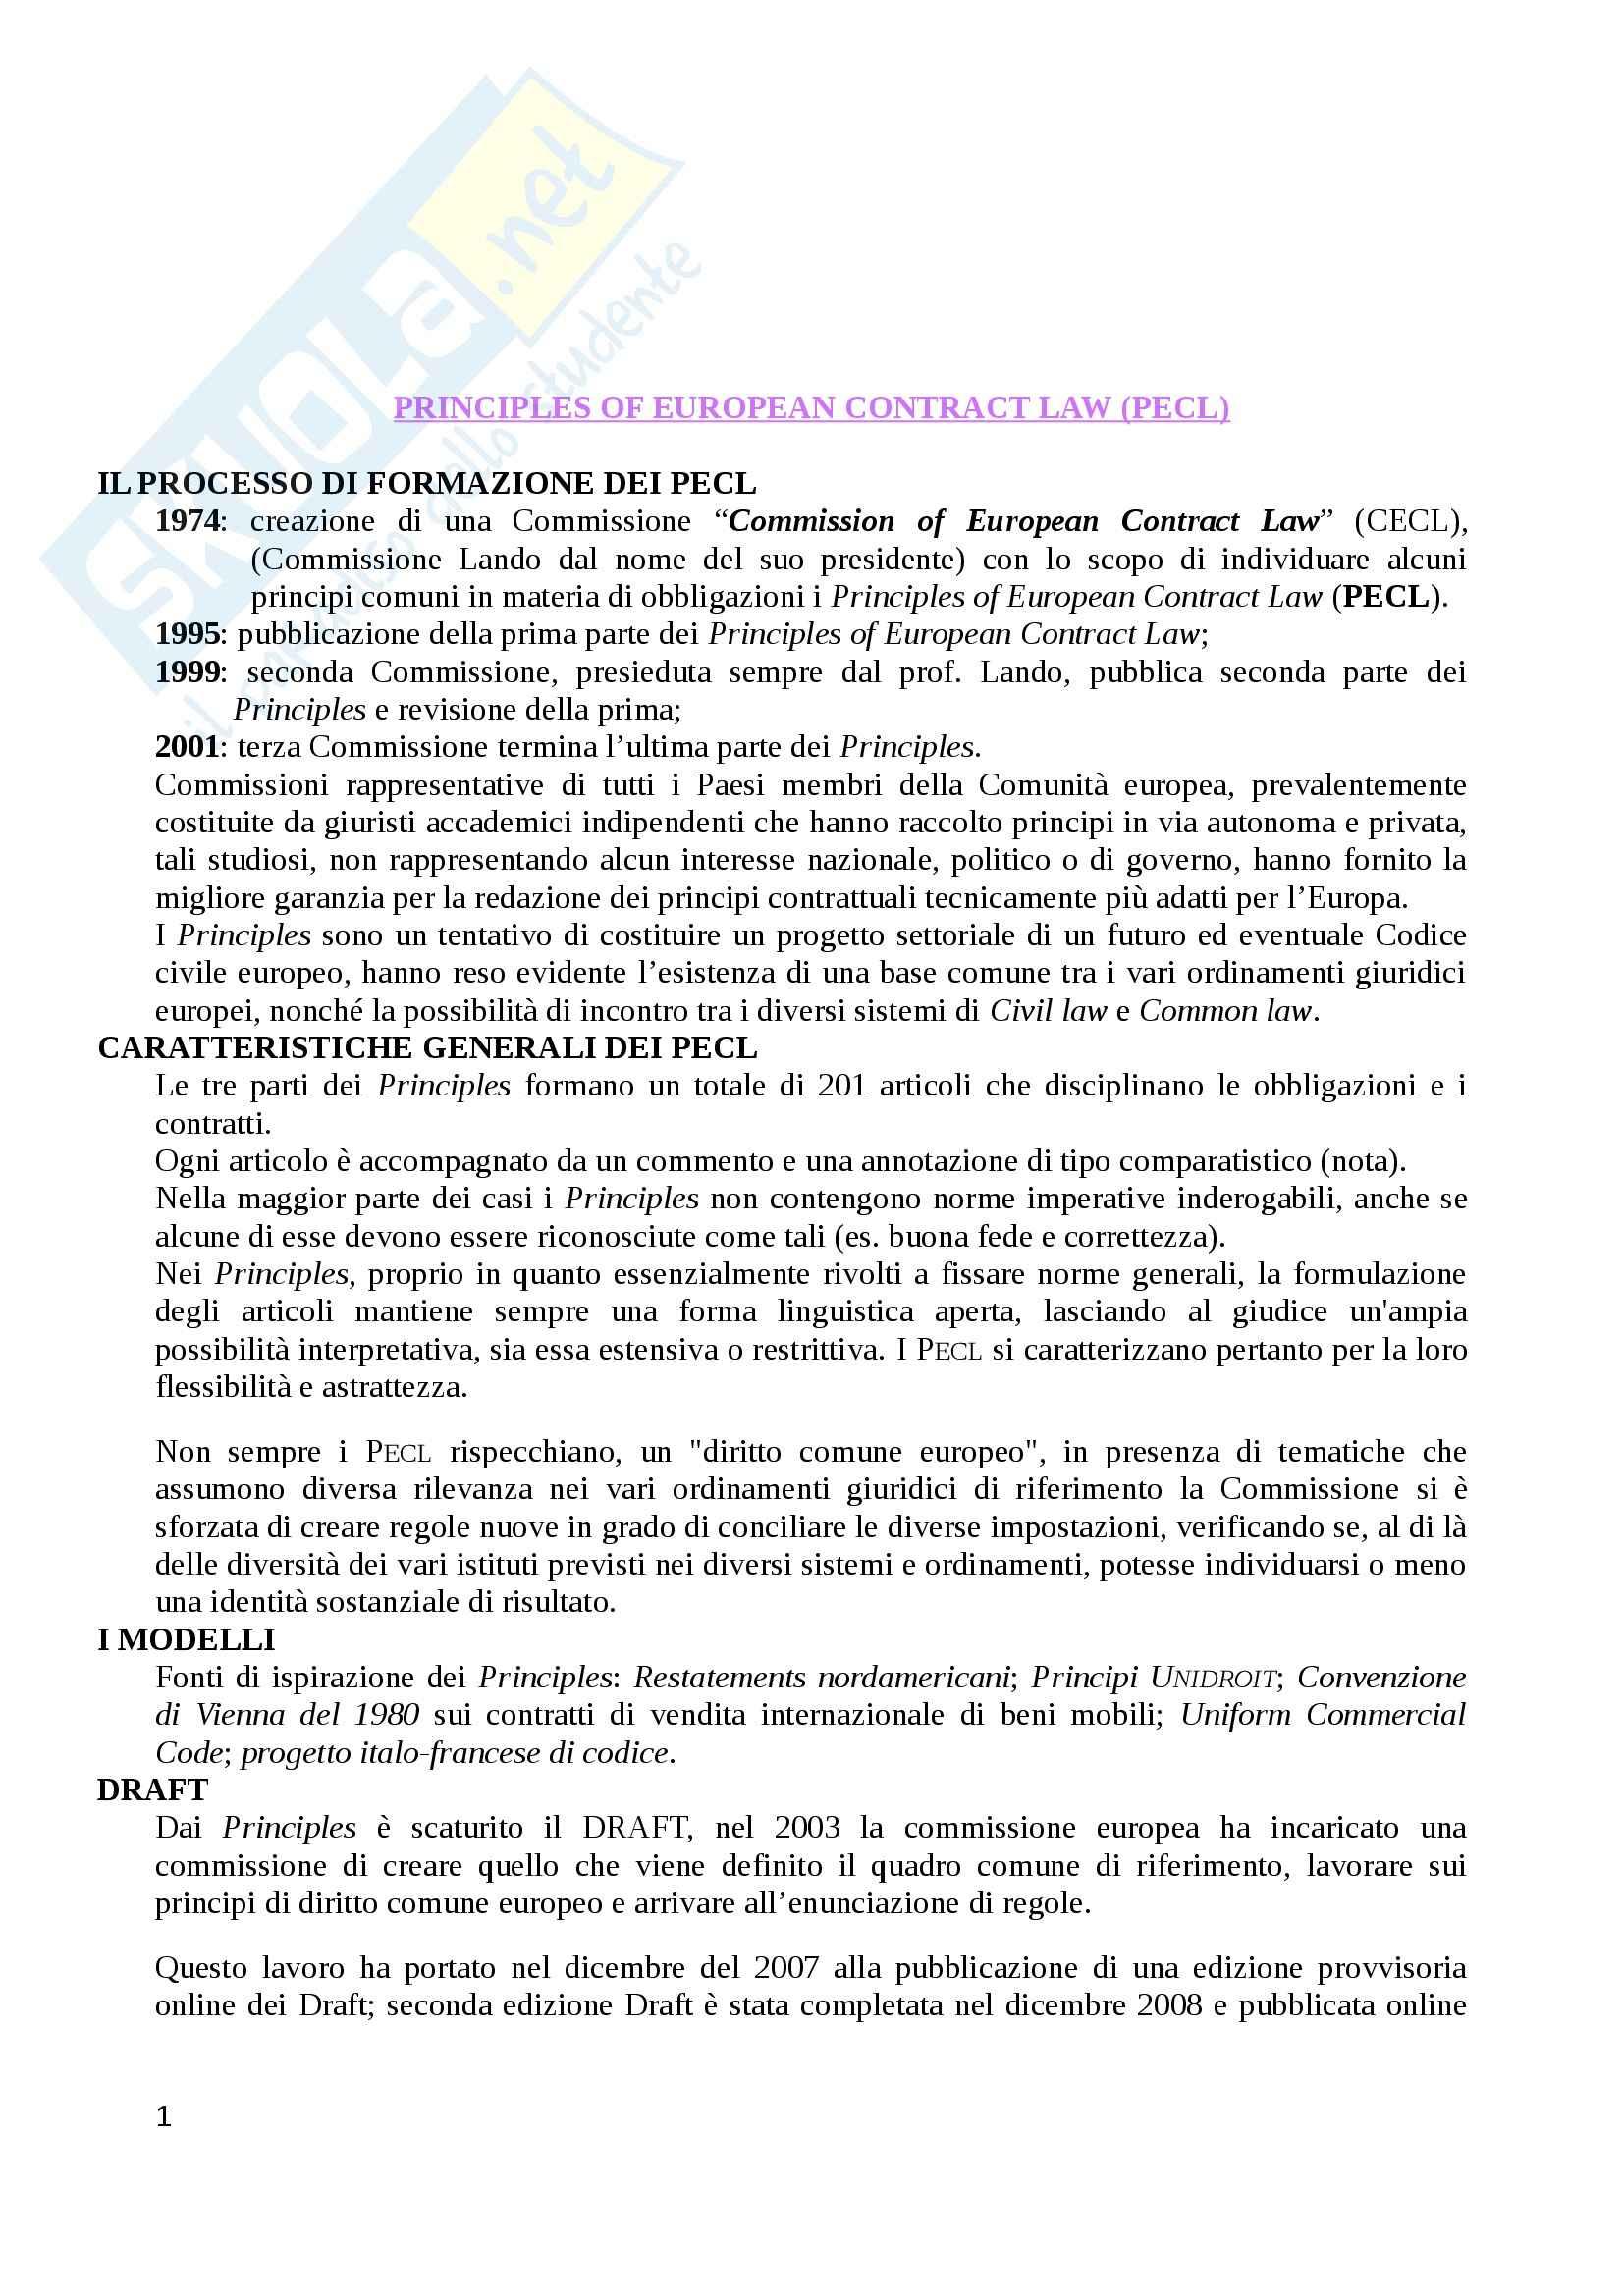 Riassunto esame Diritto europeo, prof. Luchetti